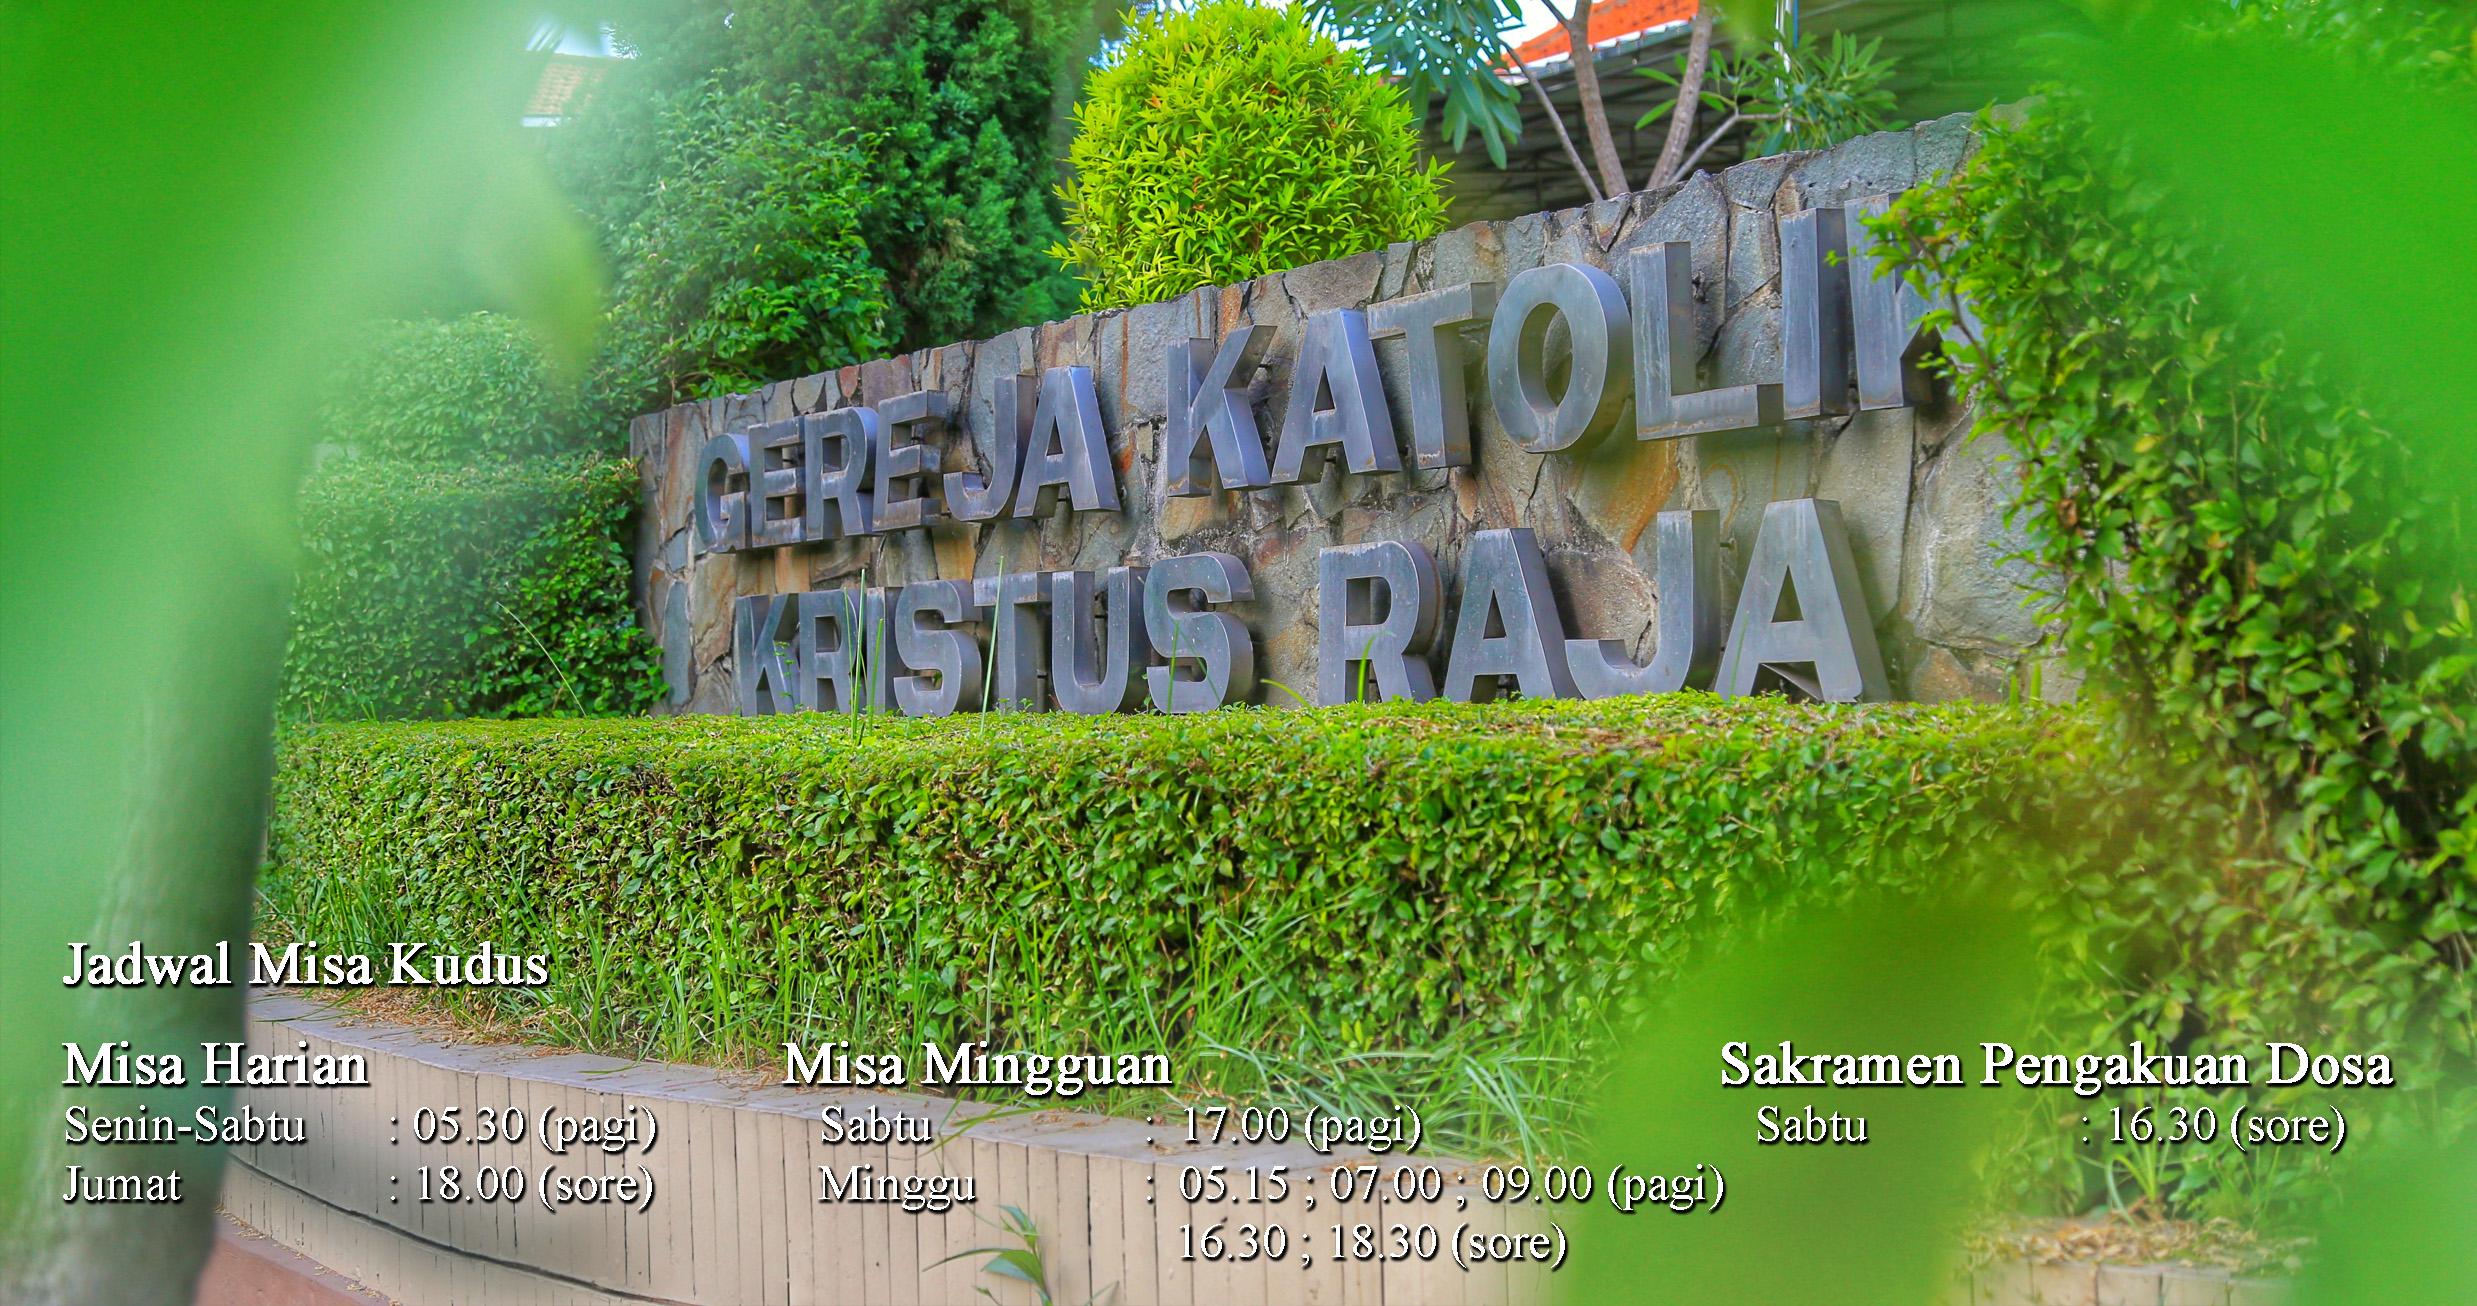 Gereja Katolik Kristus Raja Surabaya Perawan Maria Tak Berdosa Kota